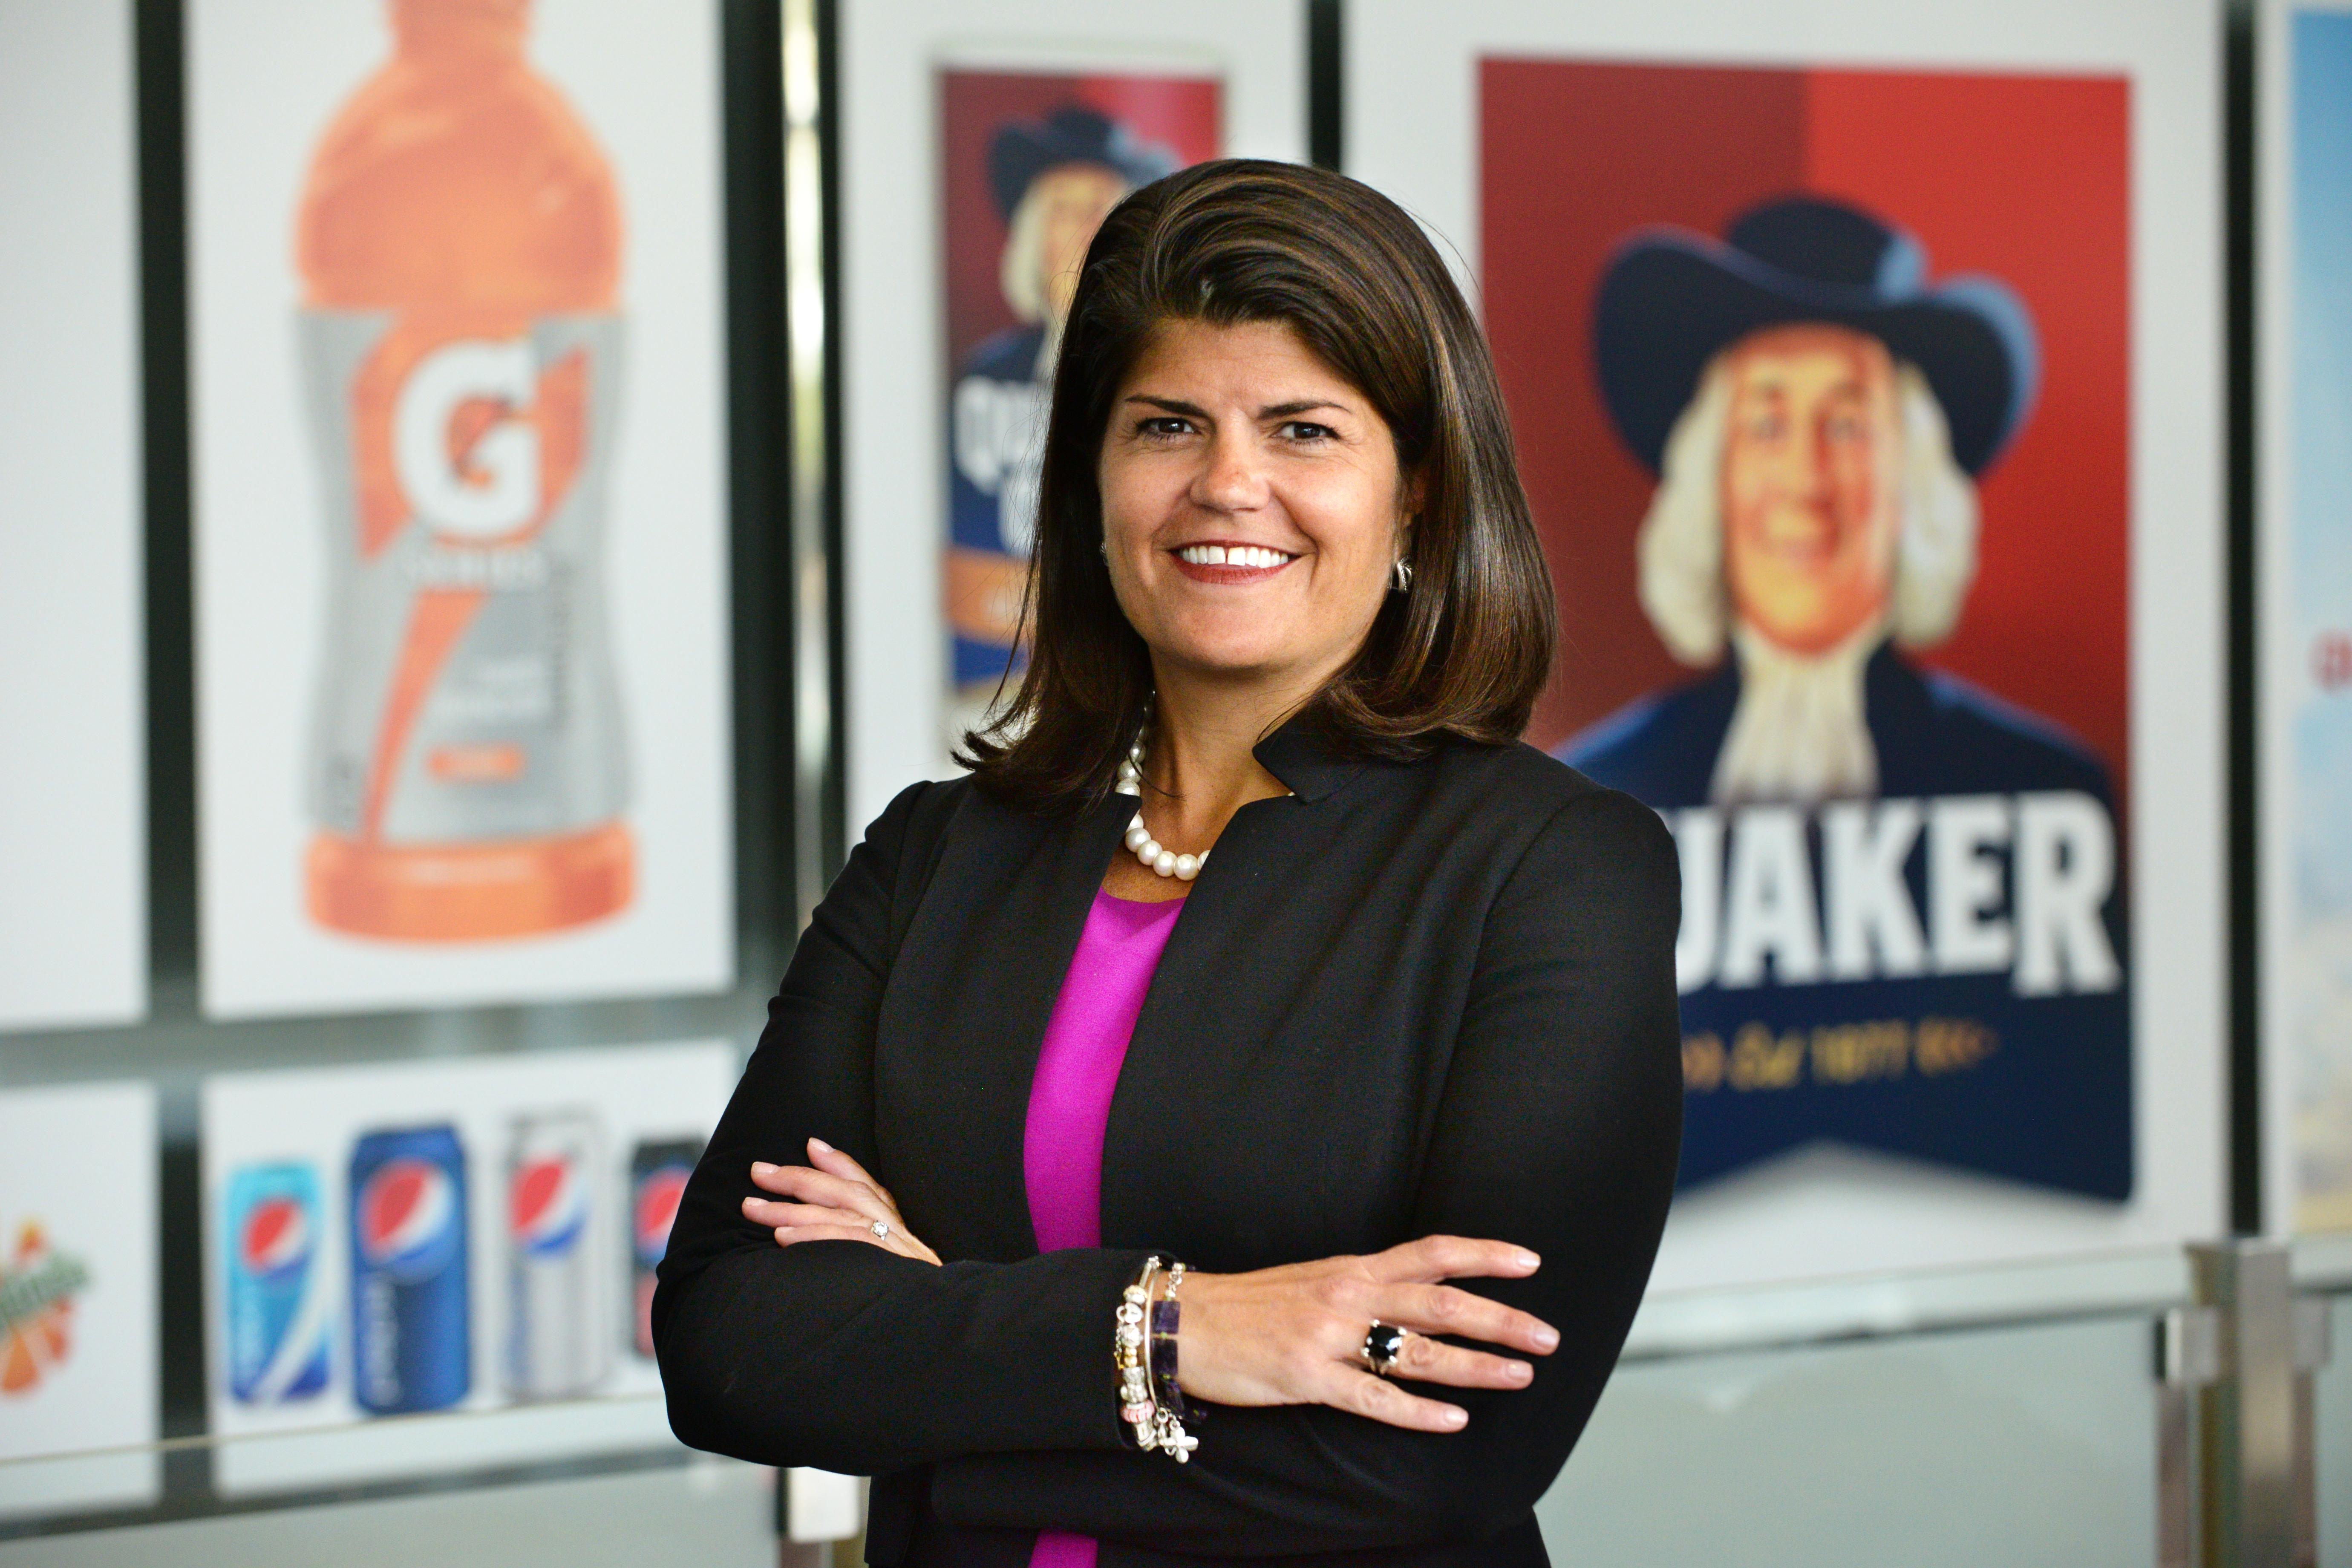 Trish Lukasik, Senior Vice President of Sales at PepsiCo